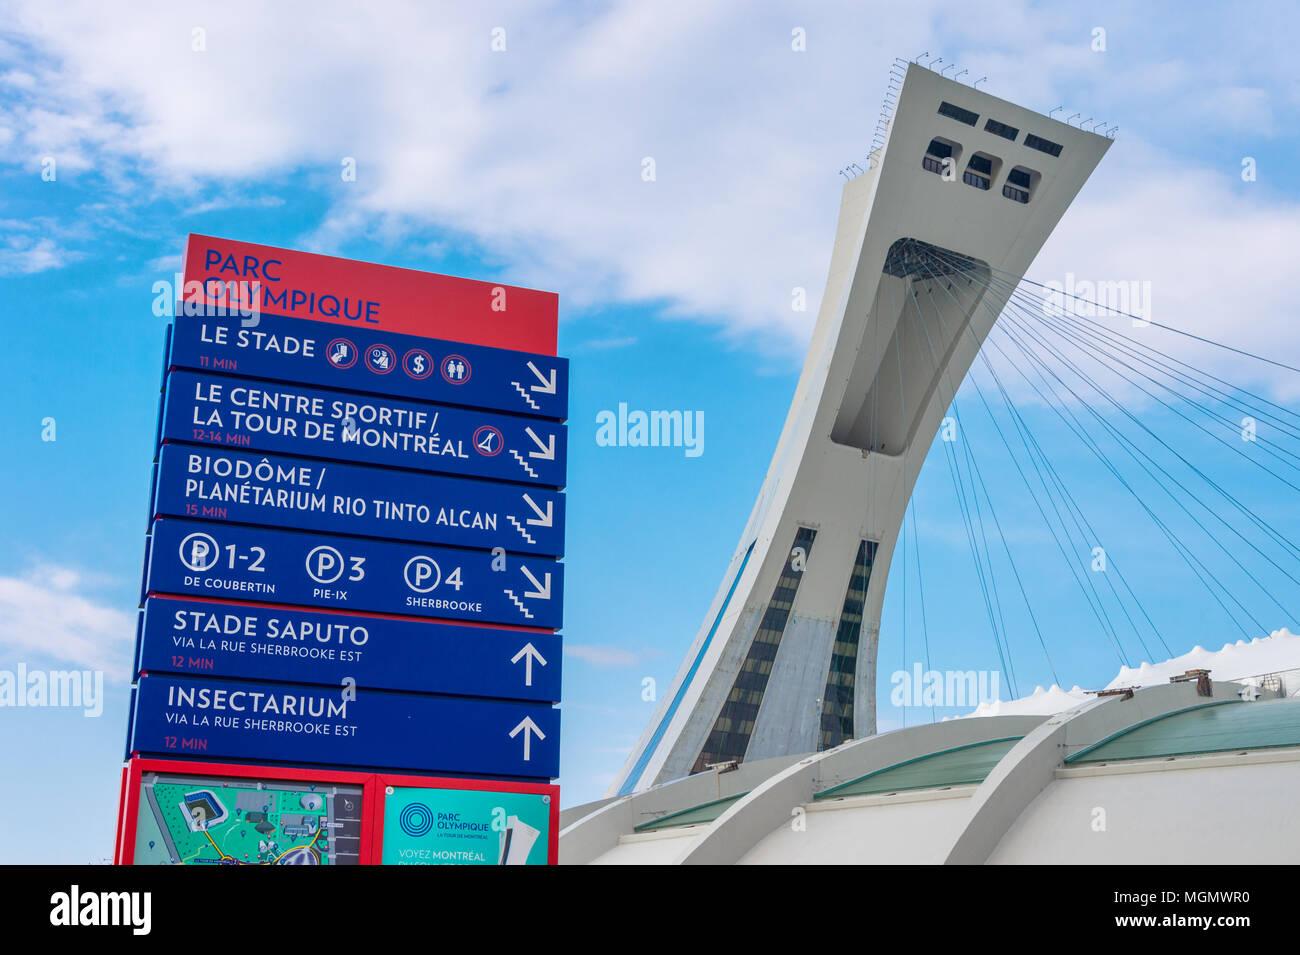 Montreal, CA - 28 Aprile 2018: Il Montreal Olympic Stadium e Torre inclinata. Immagini Stock